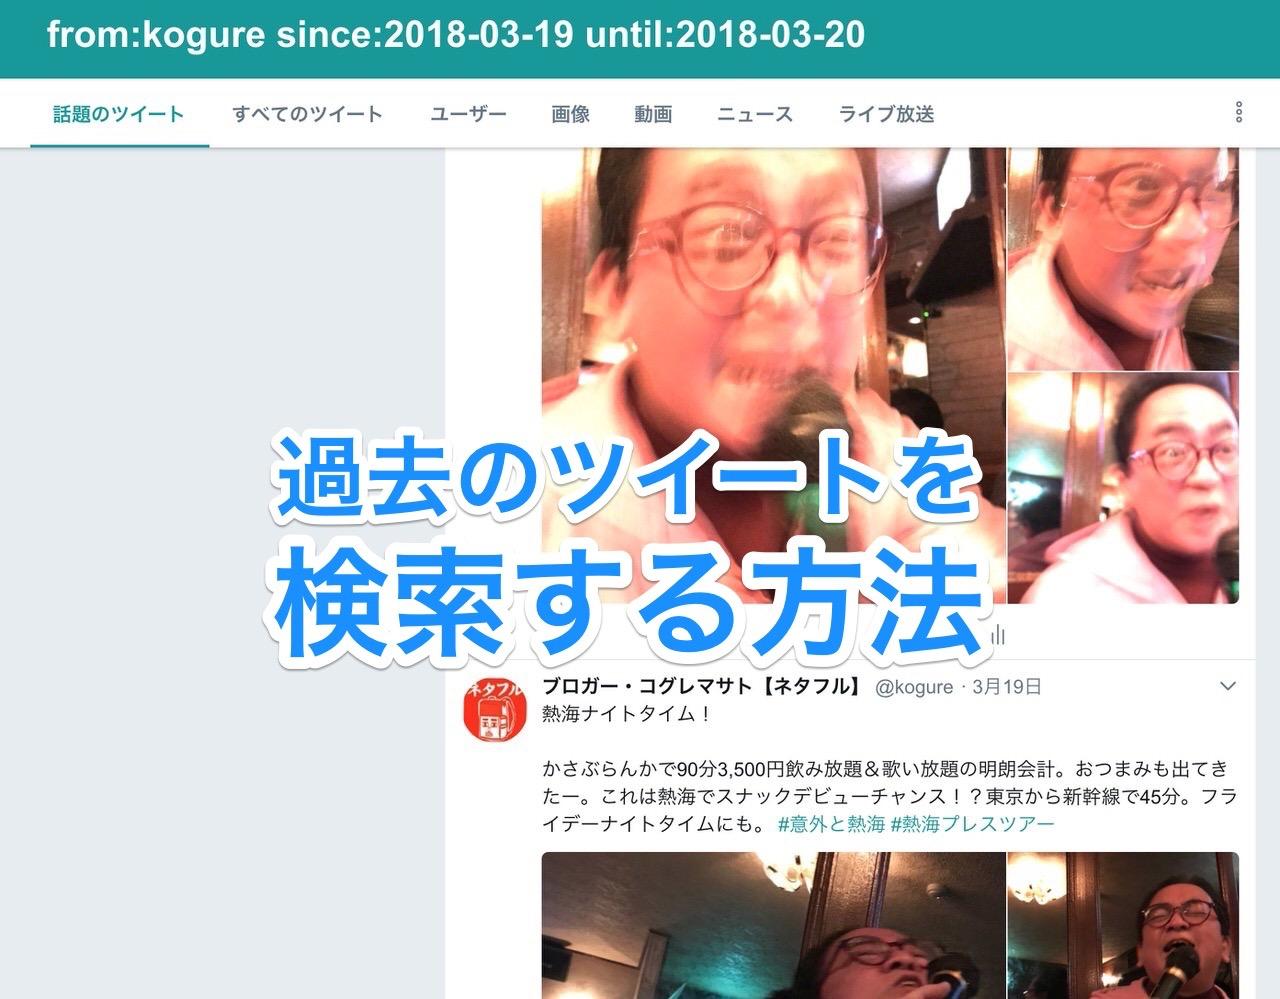 【Twitter】過去のツイートを日付から検索する方法